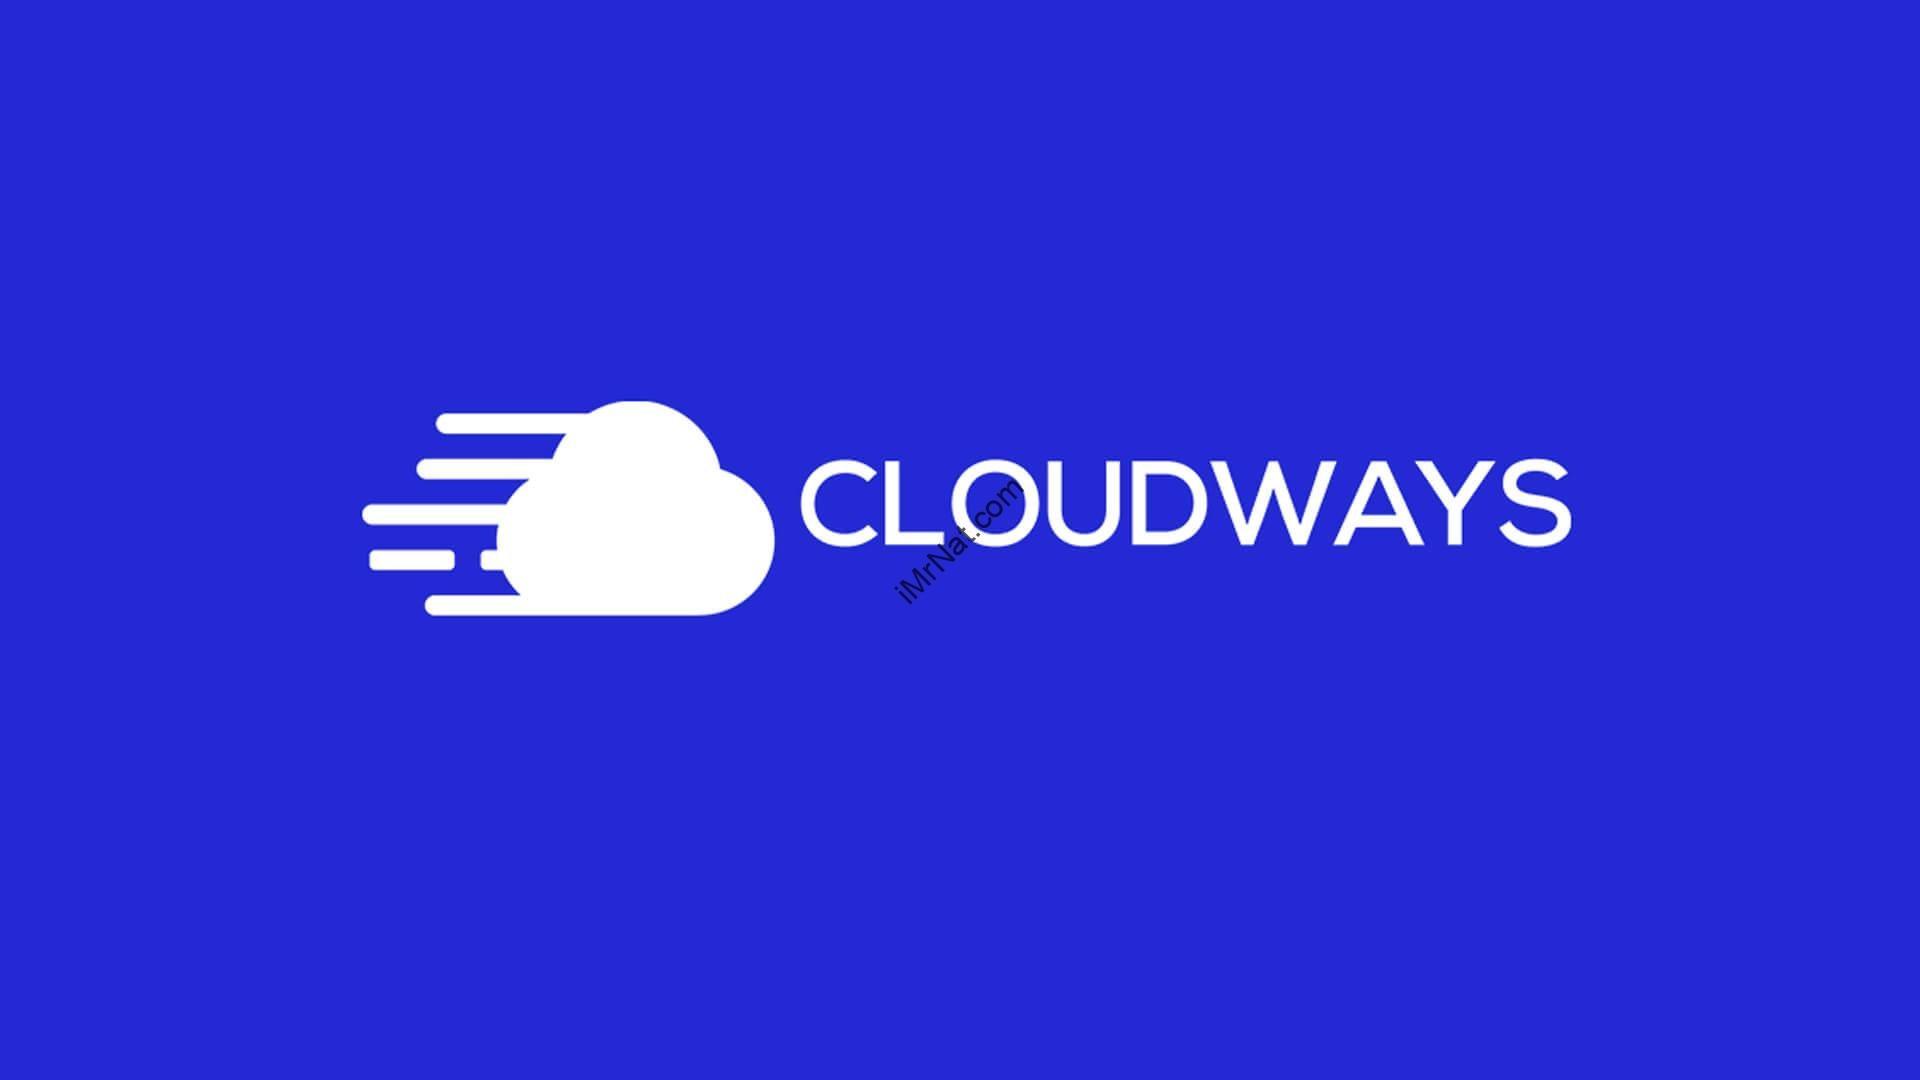 Cloudways feature image